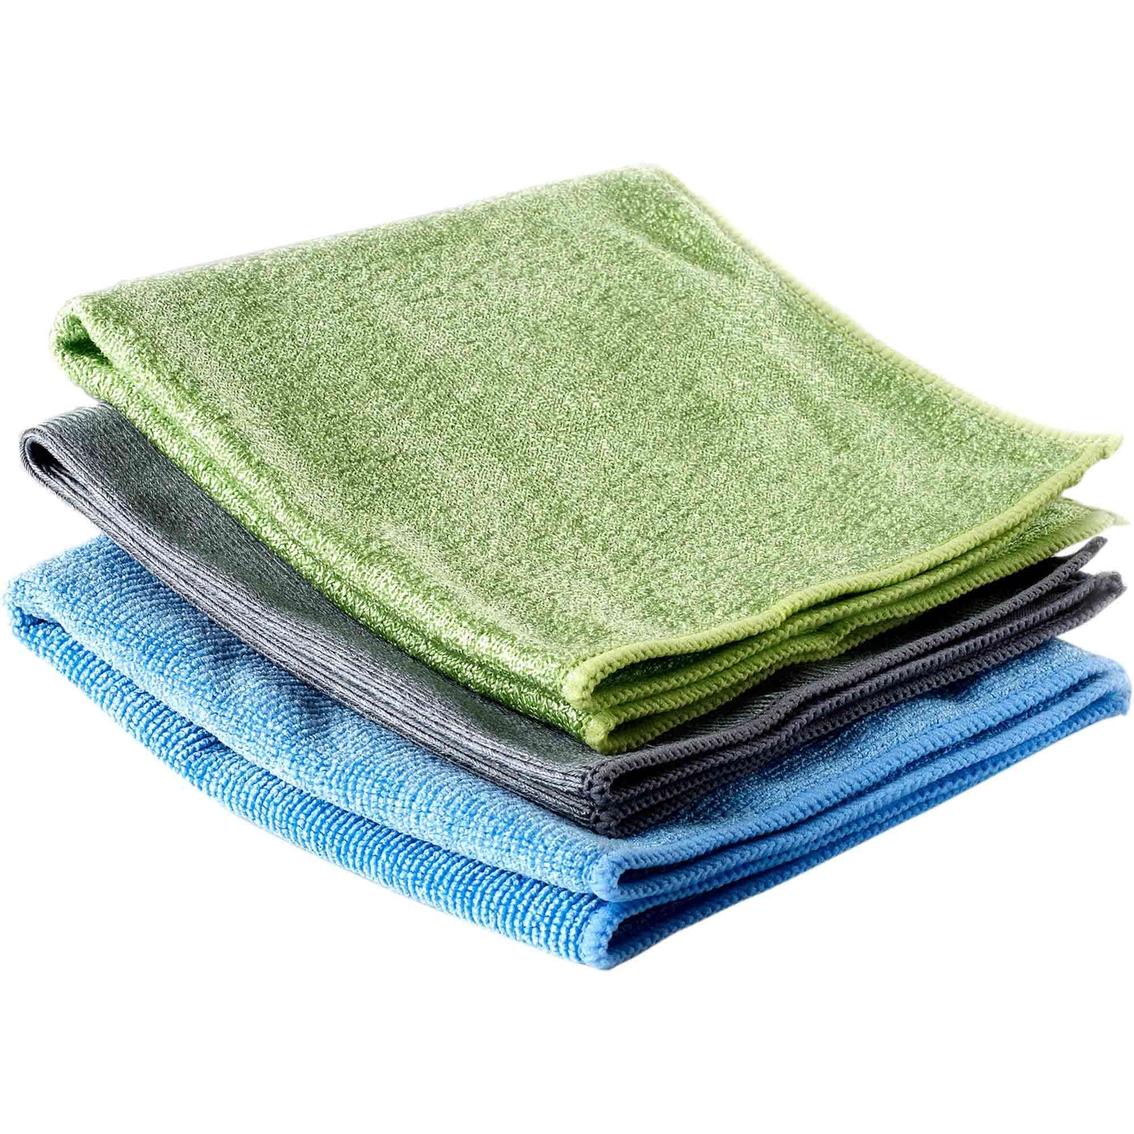 Microfiber Towel Kit: O-cedar Microfiber Cloth Cleaning Kit